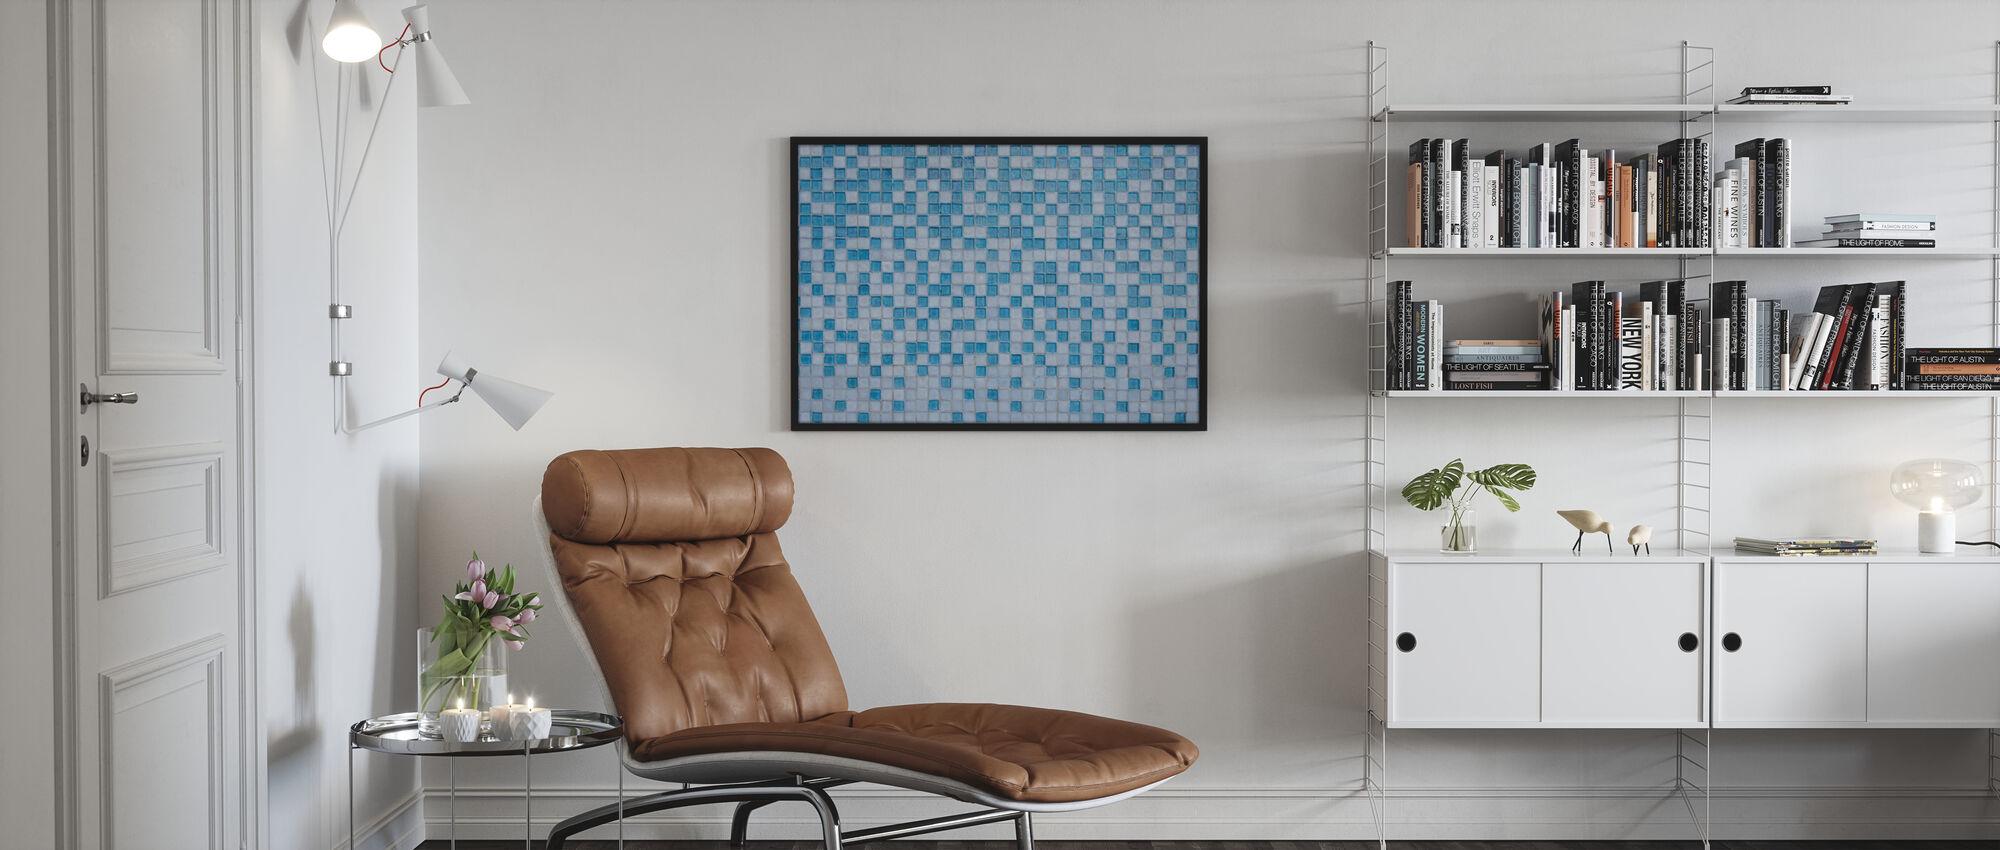 Miami Mosaic - Plakat - Stue